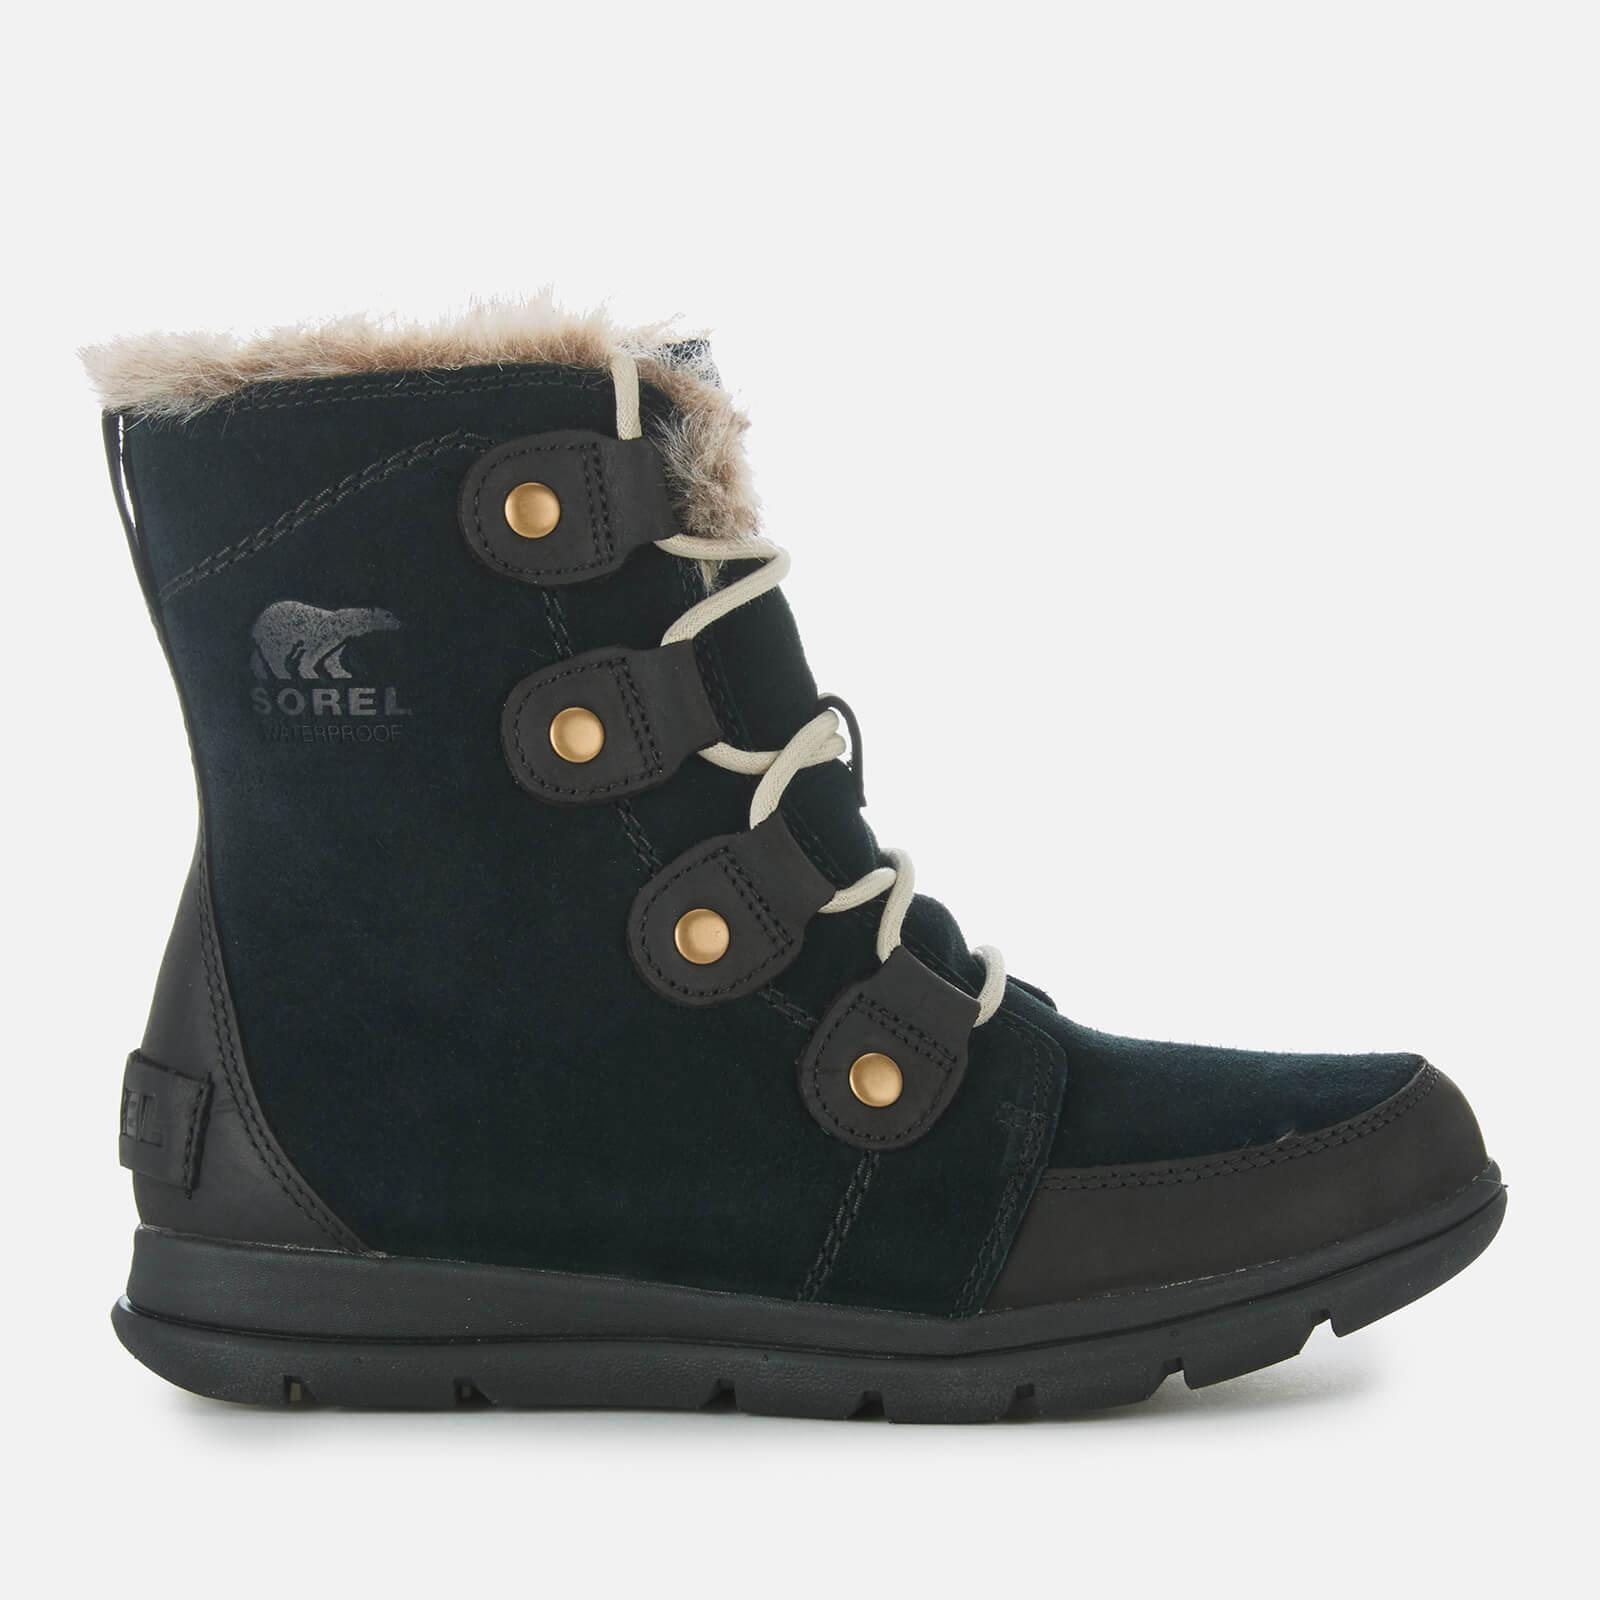 Sorel Women's Explorer Joan Hiker Style Boots - Black Dark Stone - UK 7